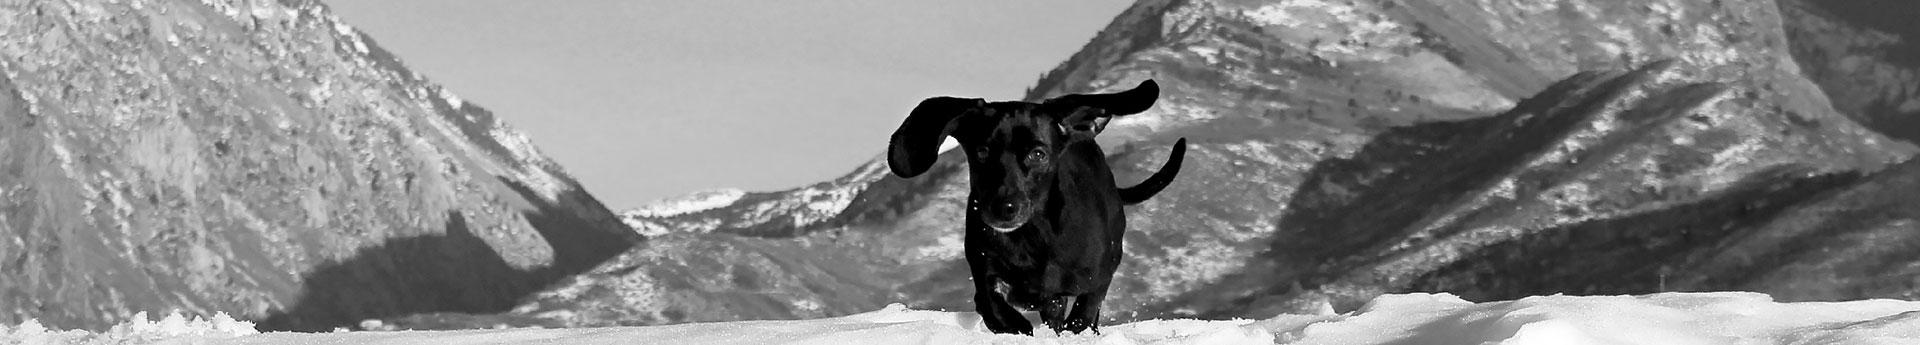 ORIJEN Tundra Dog Food - Dachshund running in the mountains - Rocket from Sandy, Utah